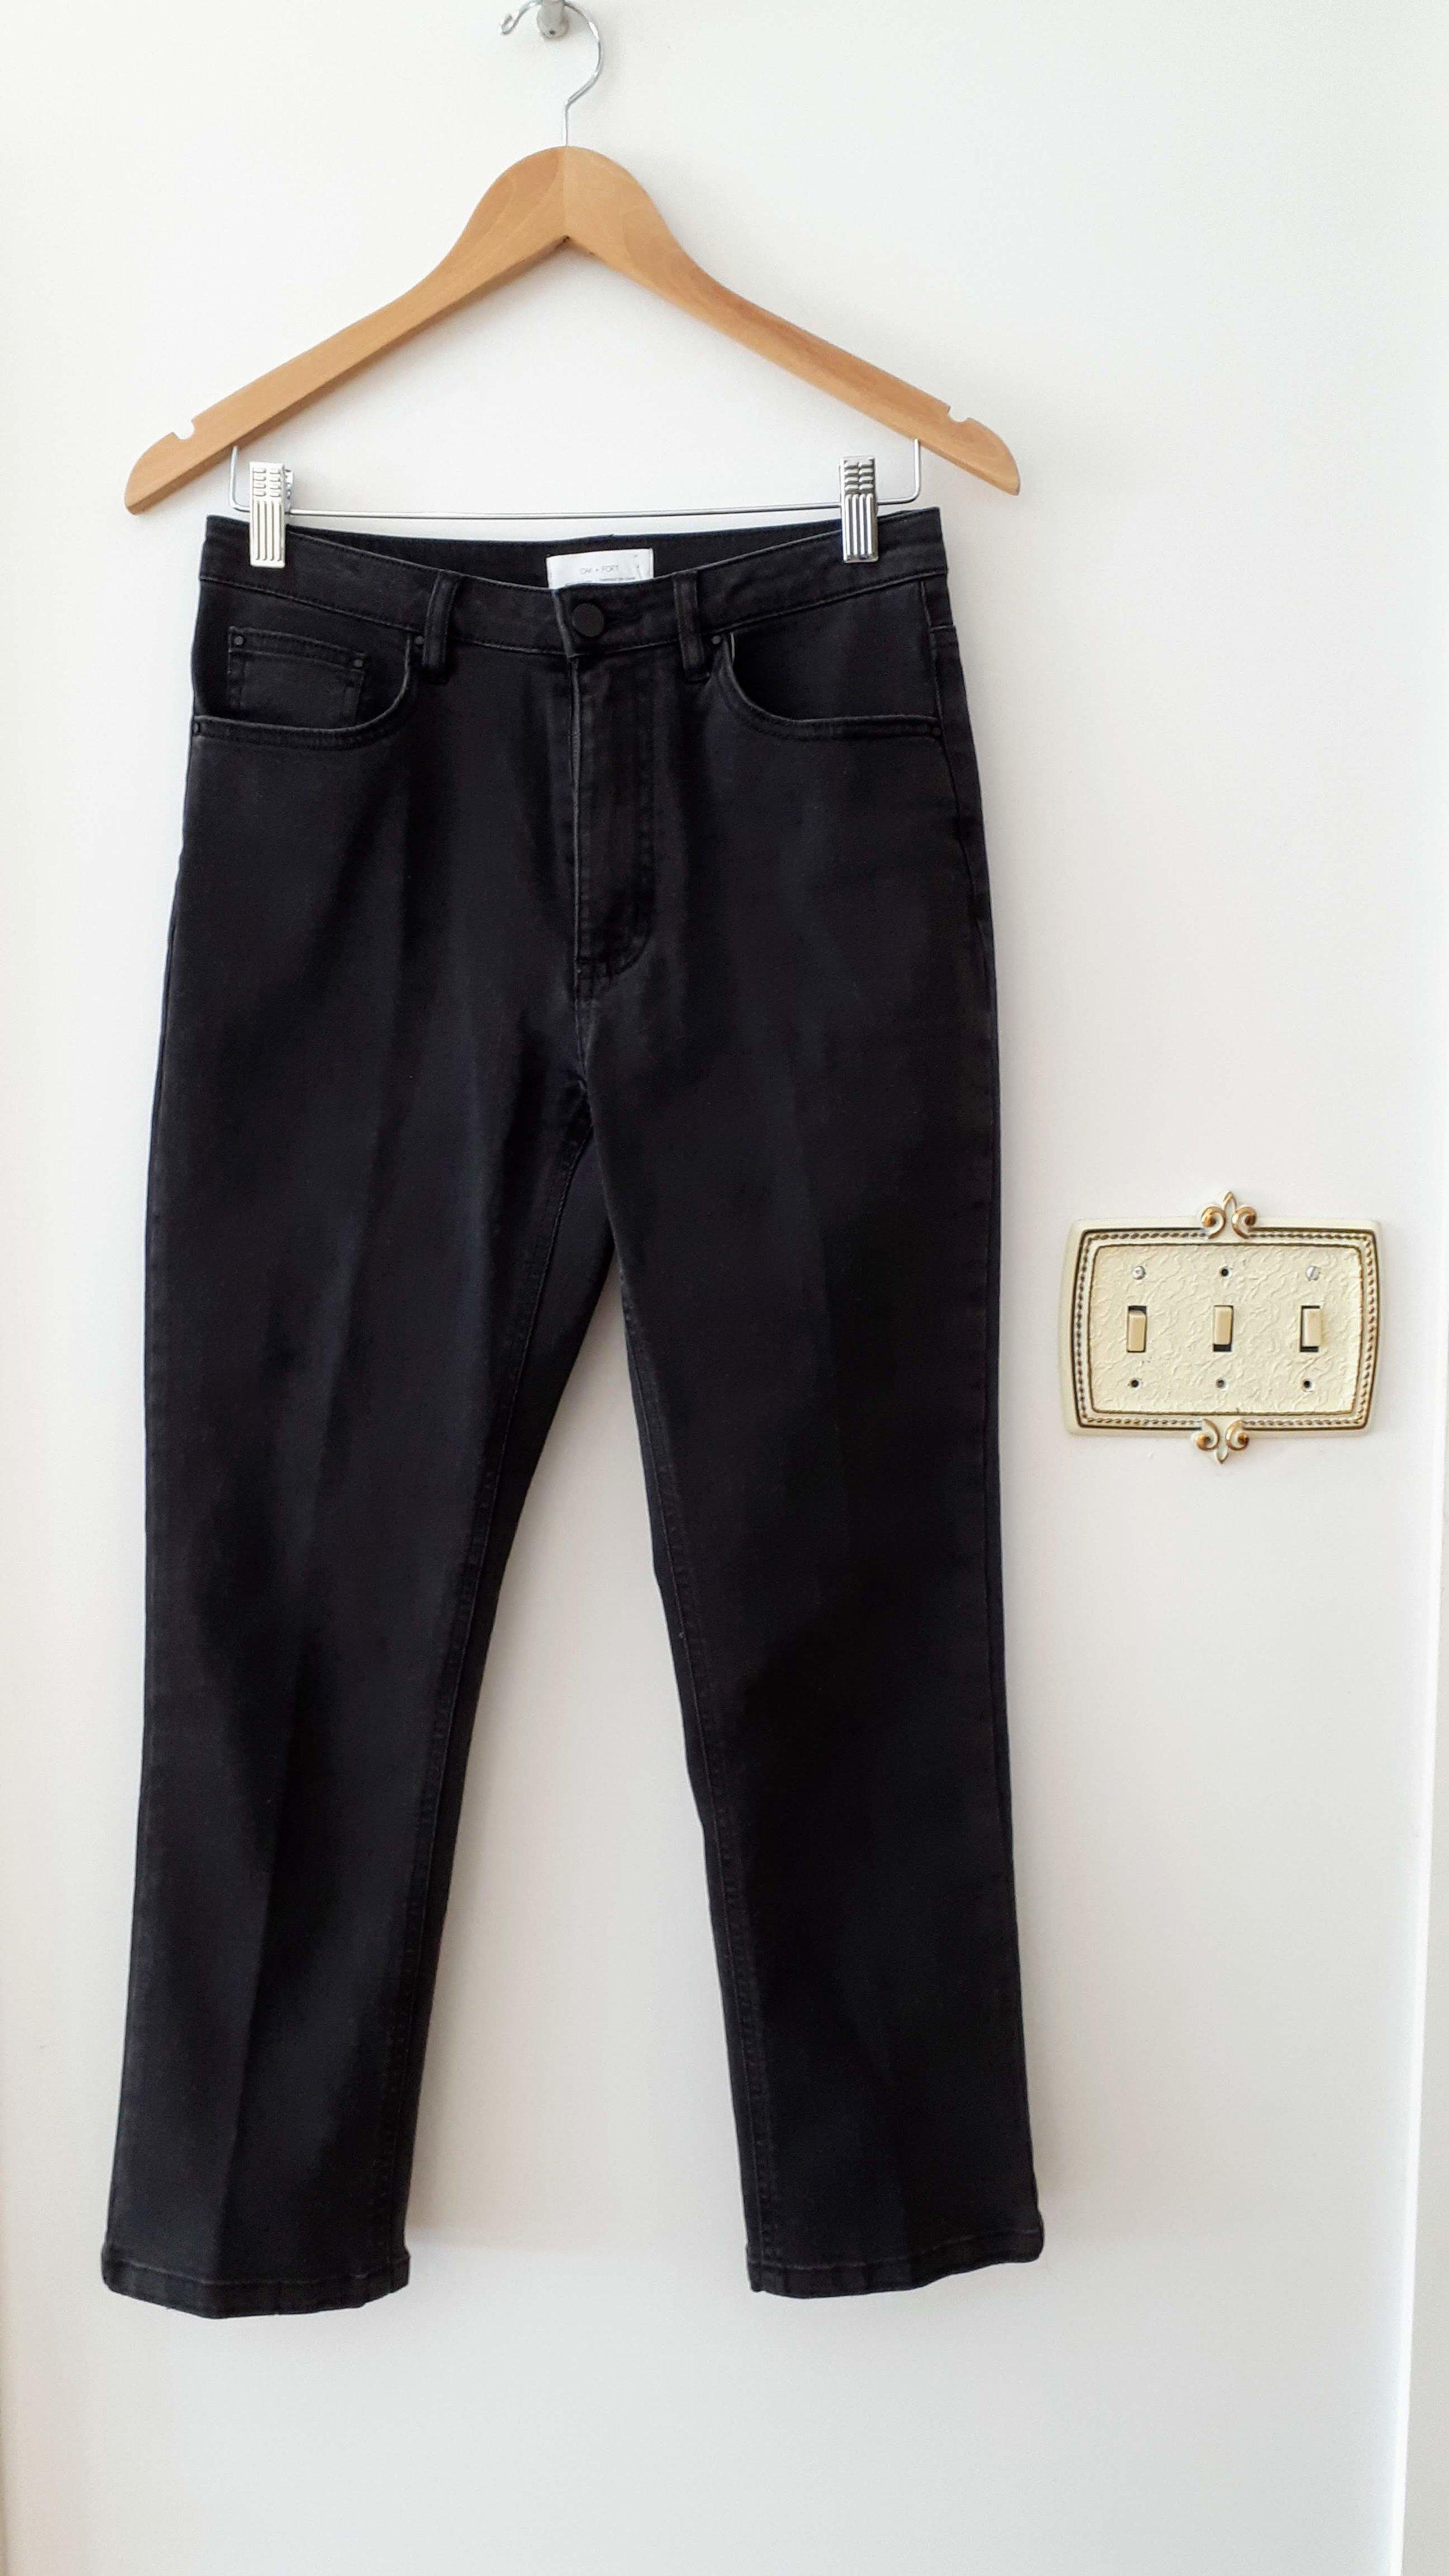 Oak+Fort pants; Size 27, $44